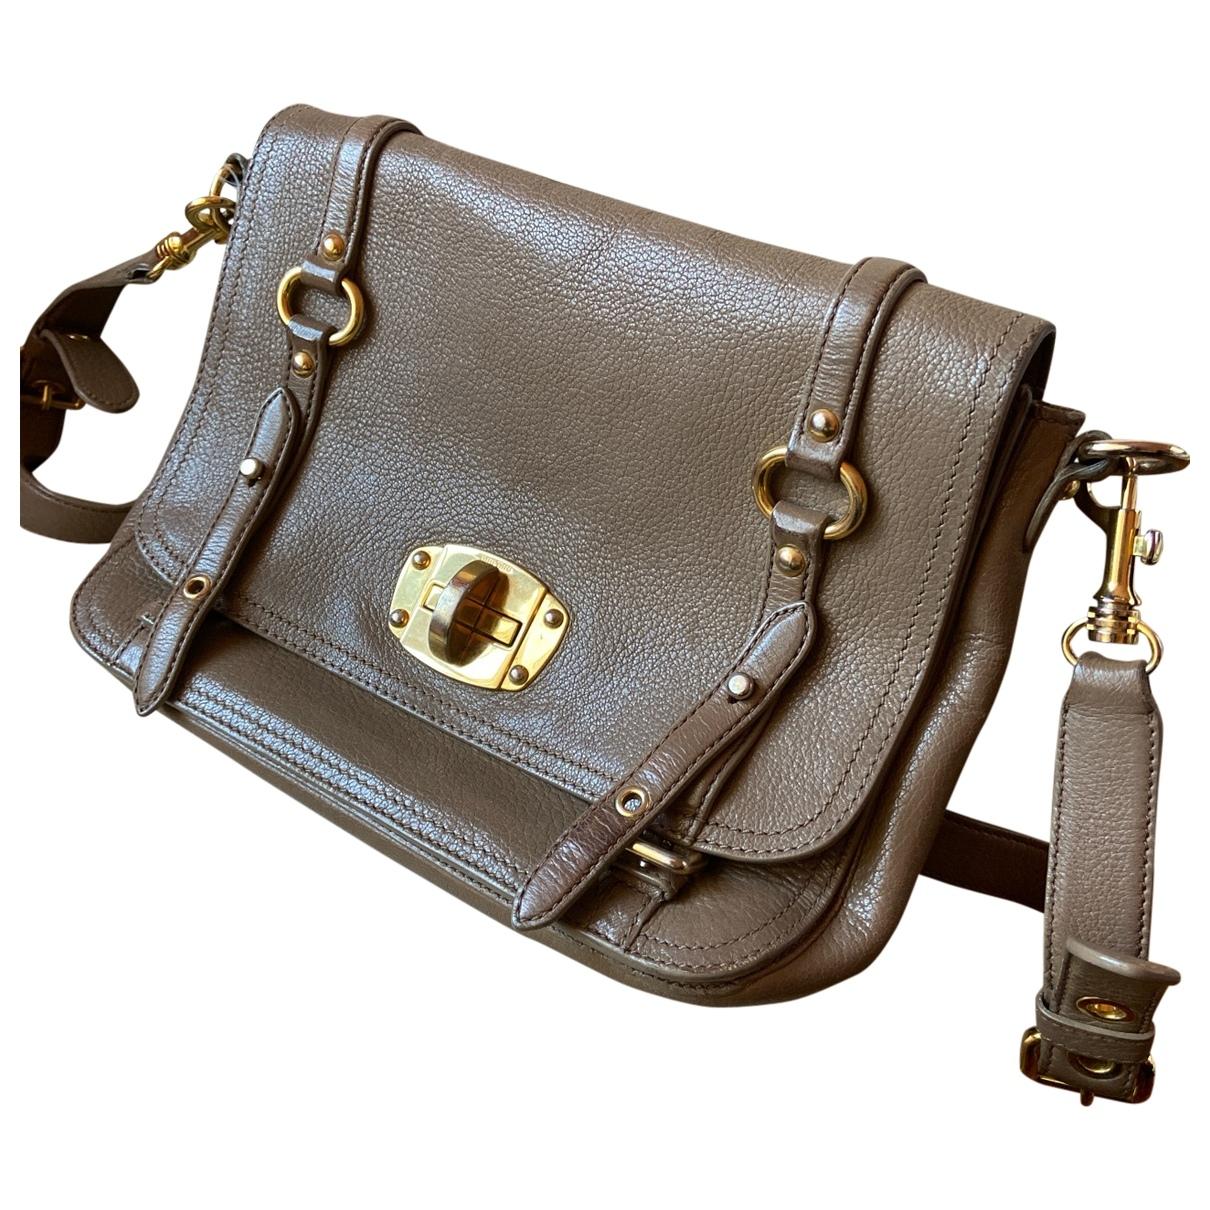 Miu Miu \N Camel Leather handbag for Women \N